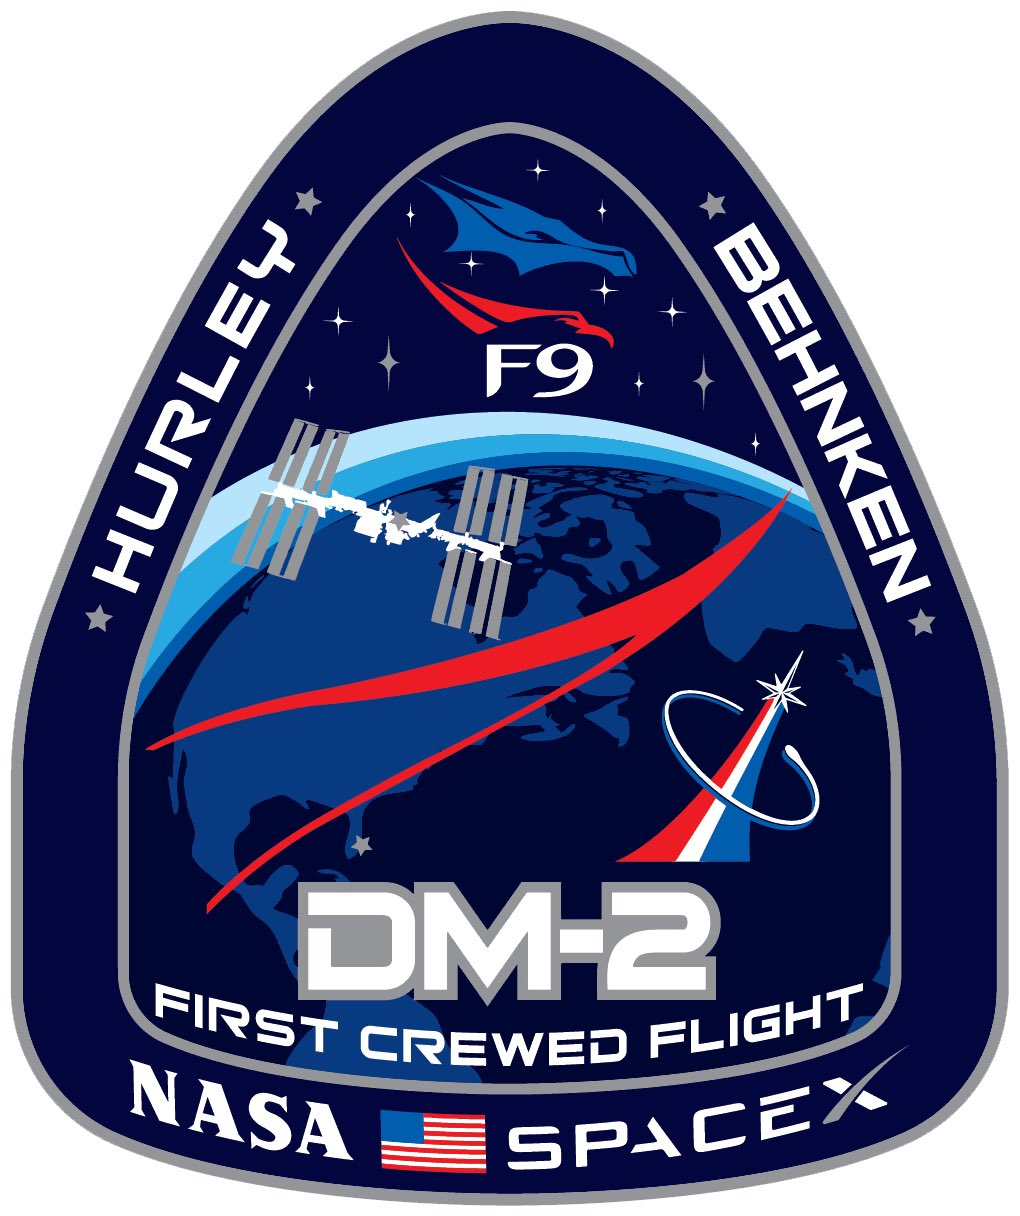 DM-2-Patch